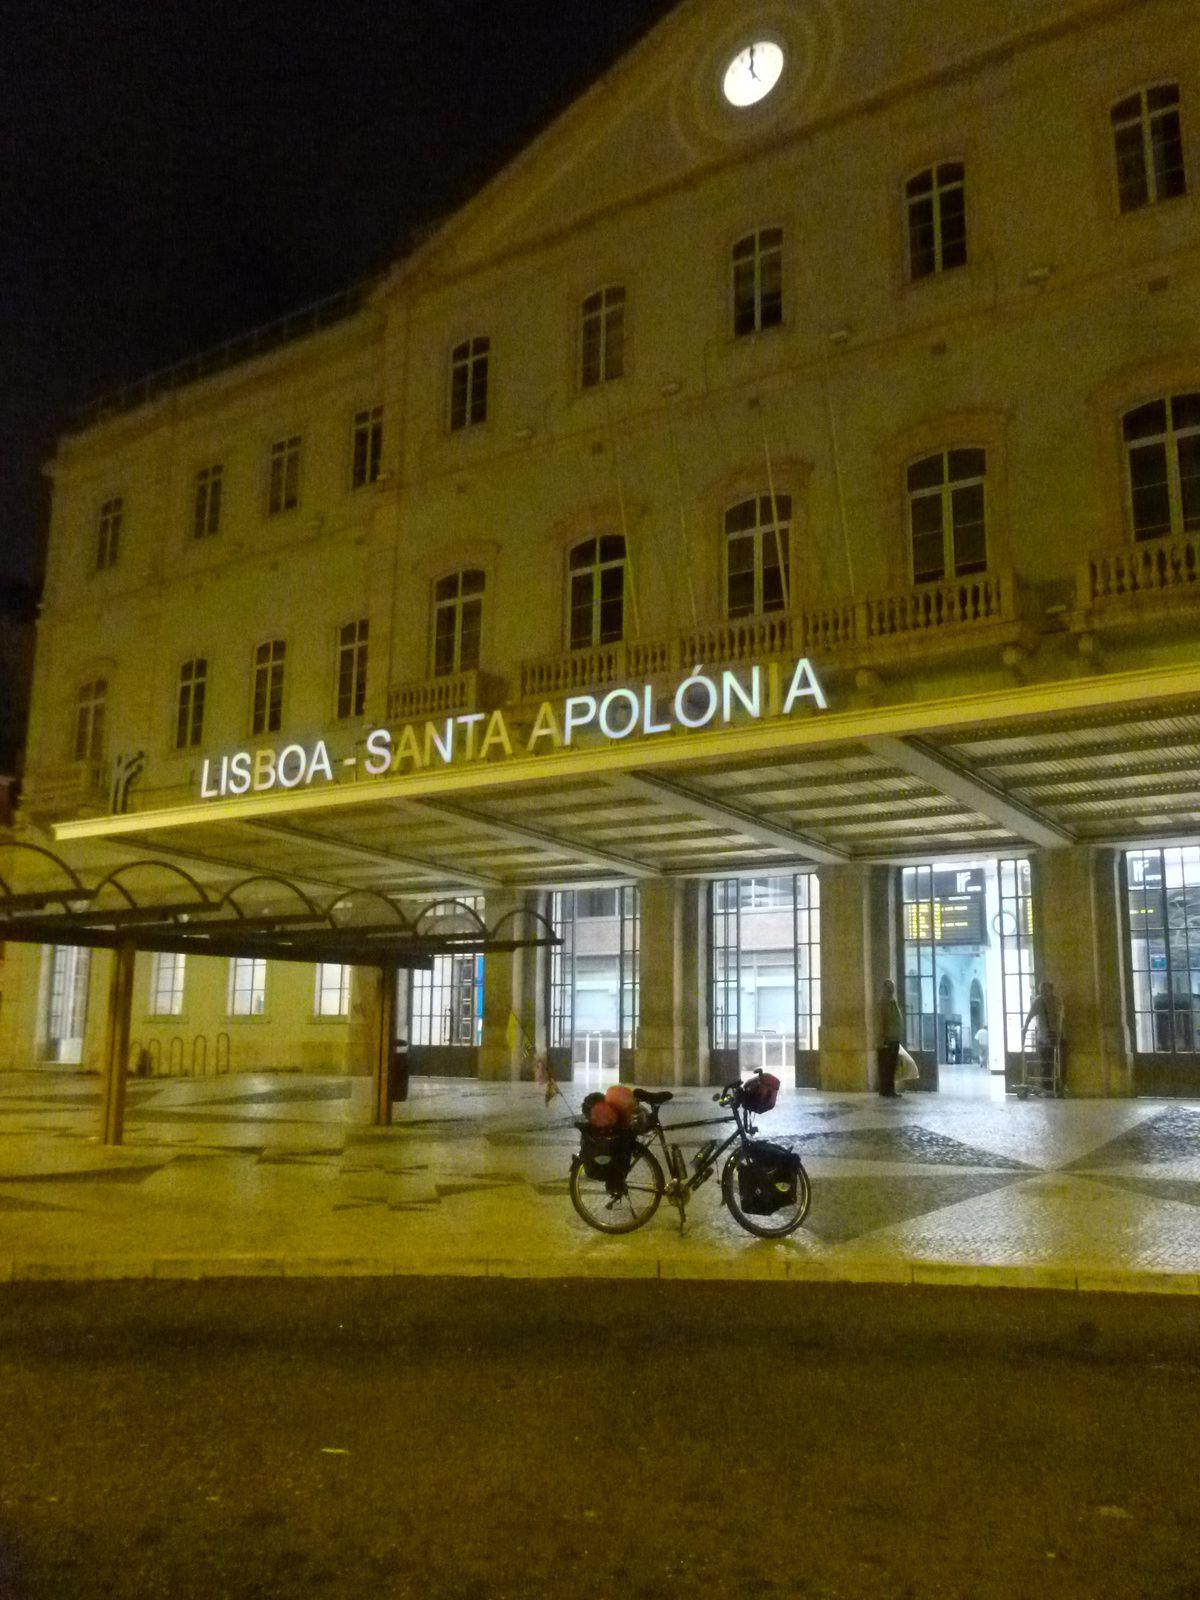 départ de Lisboa par la gare de Santa Apolonia